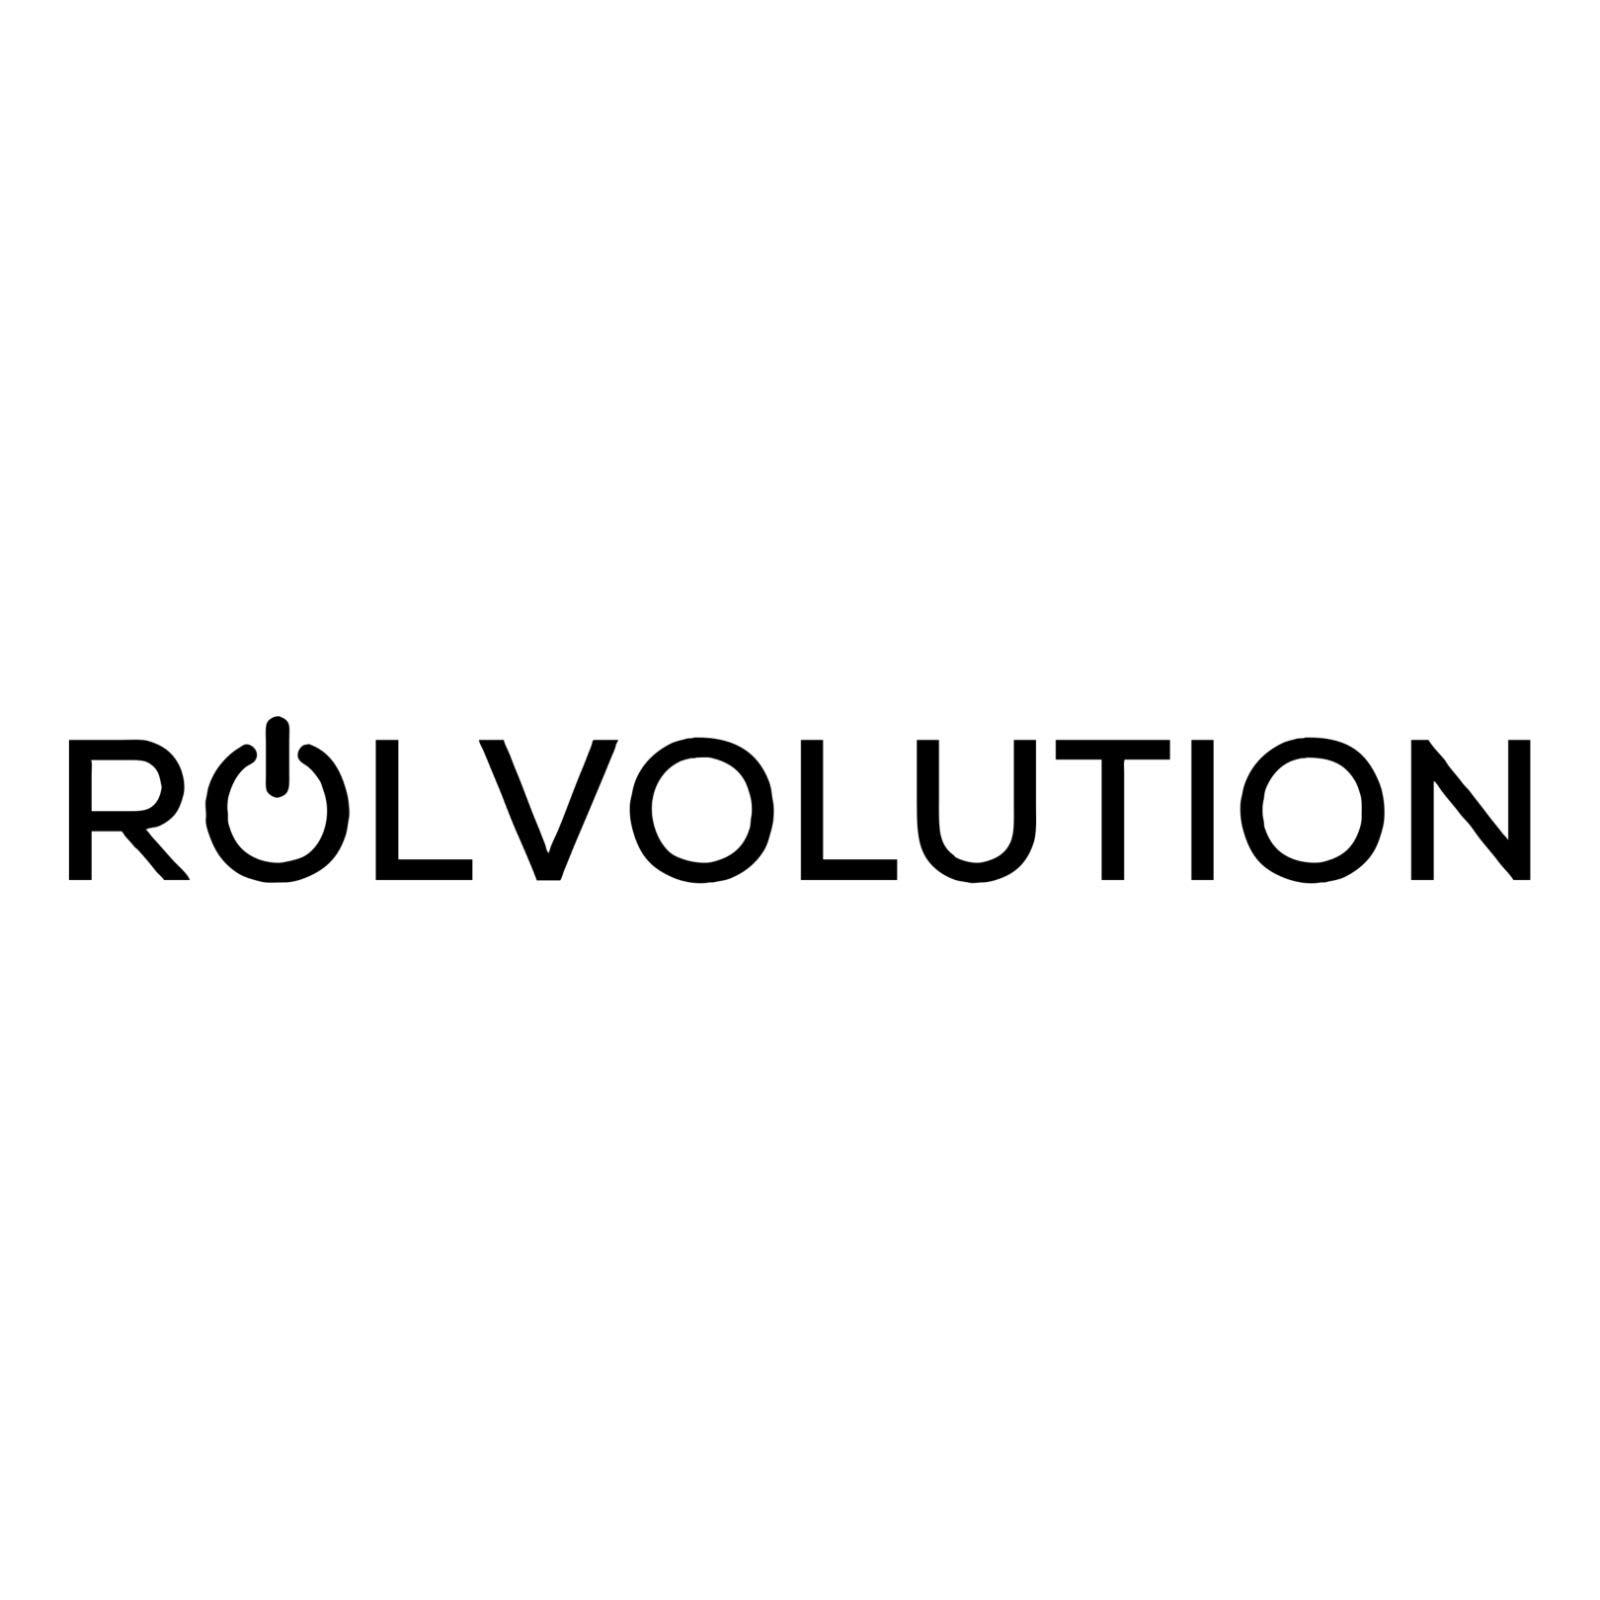 Experiència Rolvolution (29 Setembre 09:00 - 13:00h)